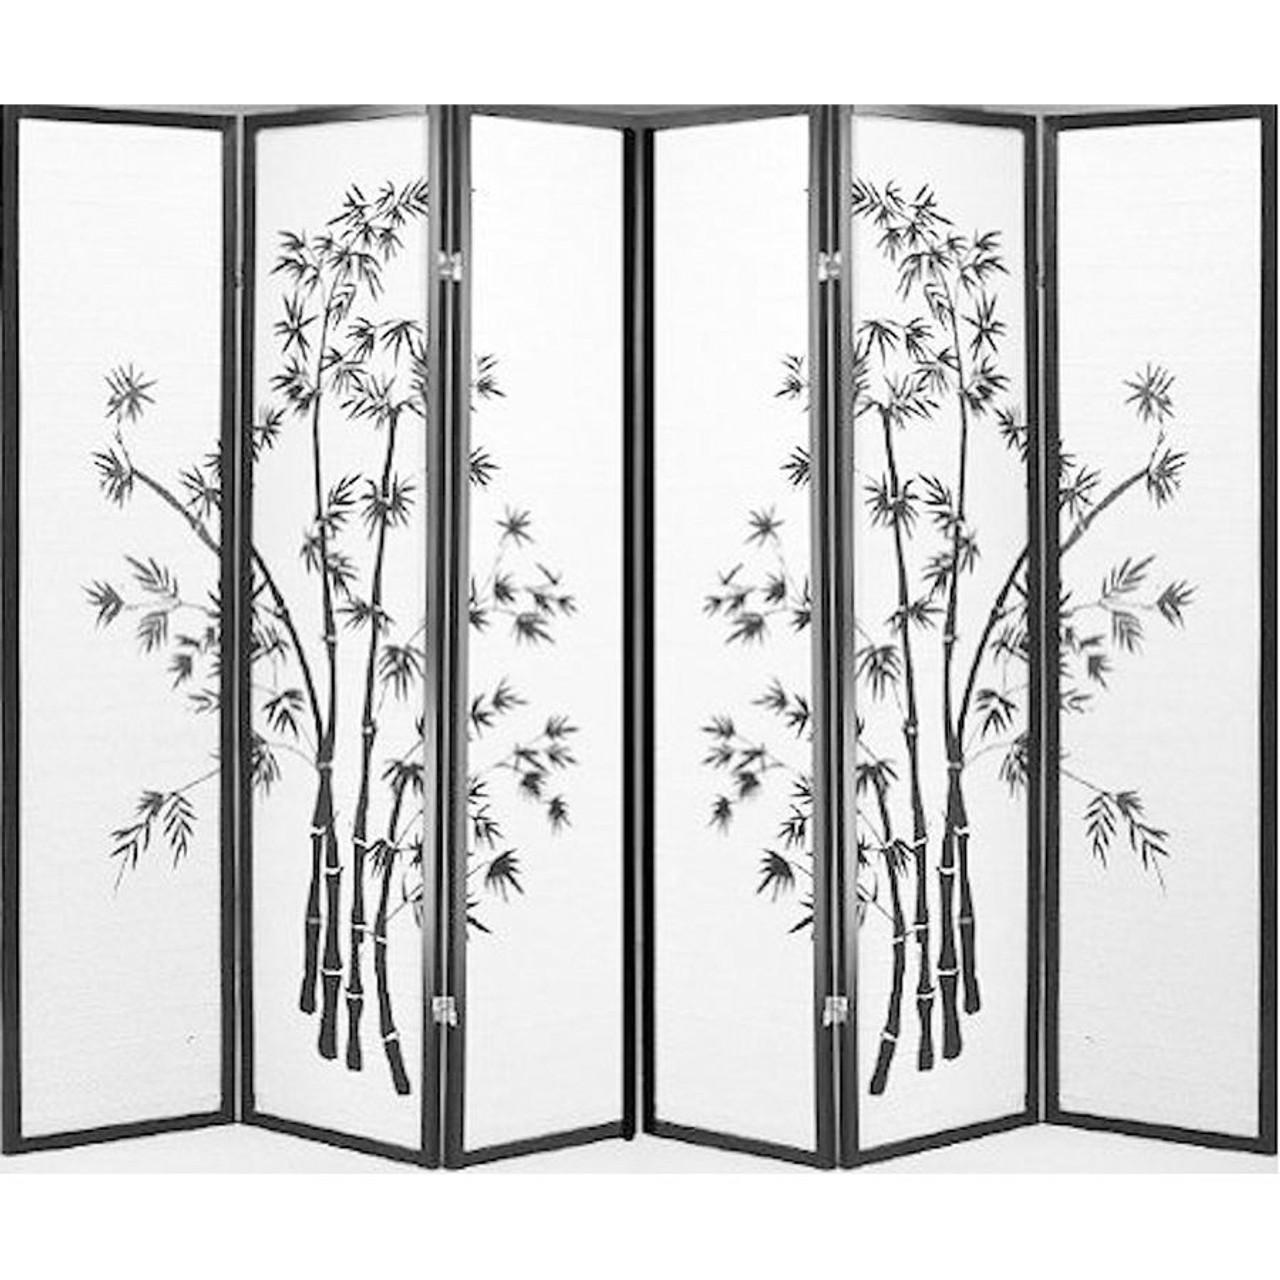 6 Panel Black Framed Bamboo Print Room Divider